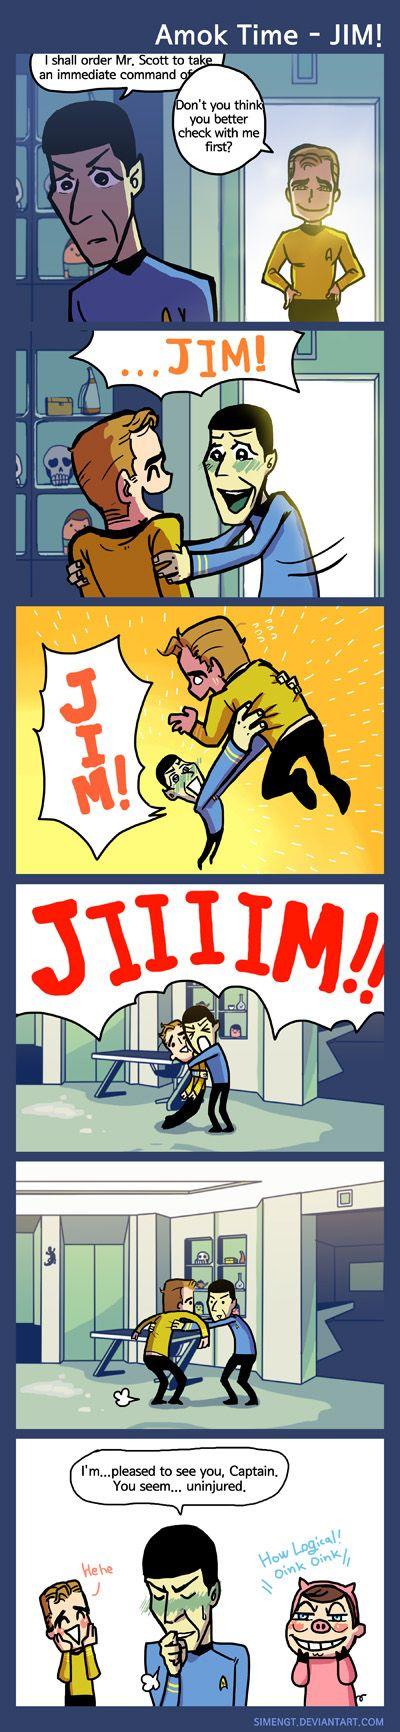 ST - Amok time - JIM by simengt.deviantart.com on @deviantART